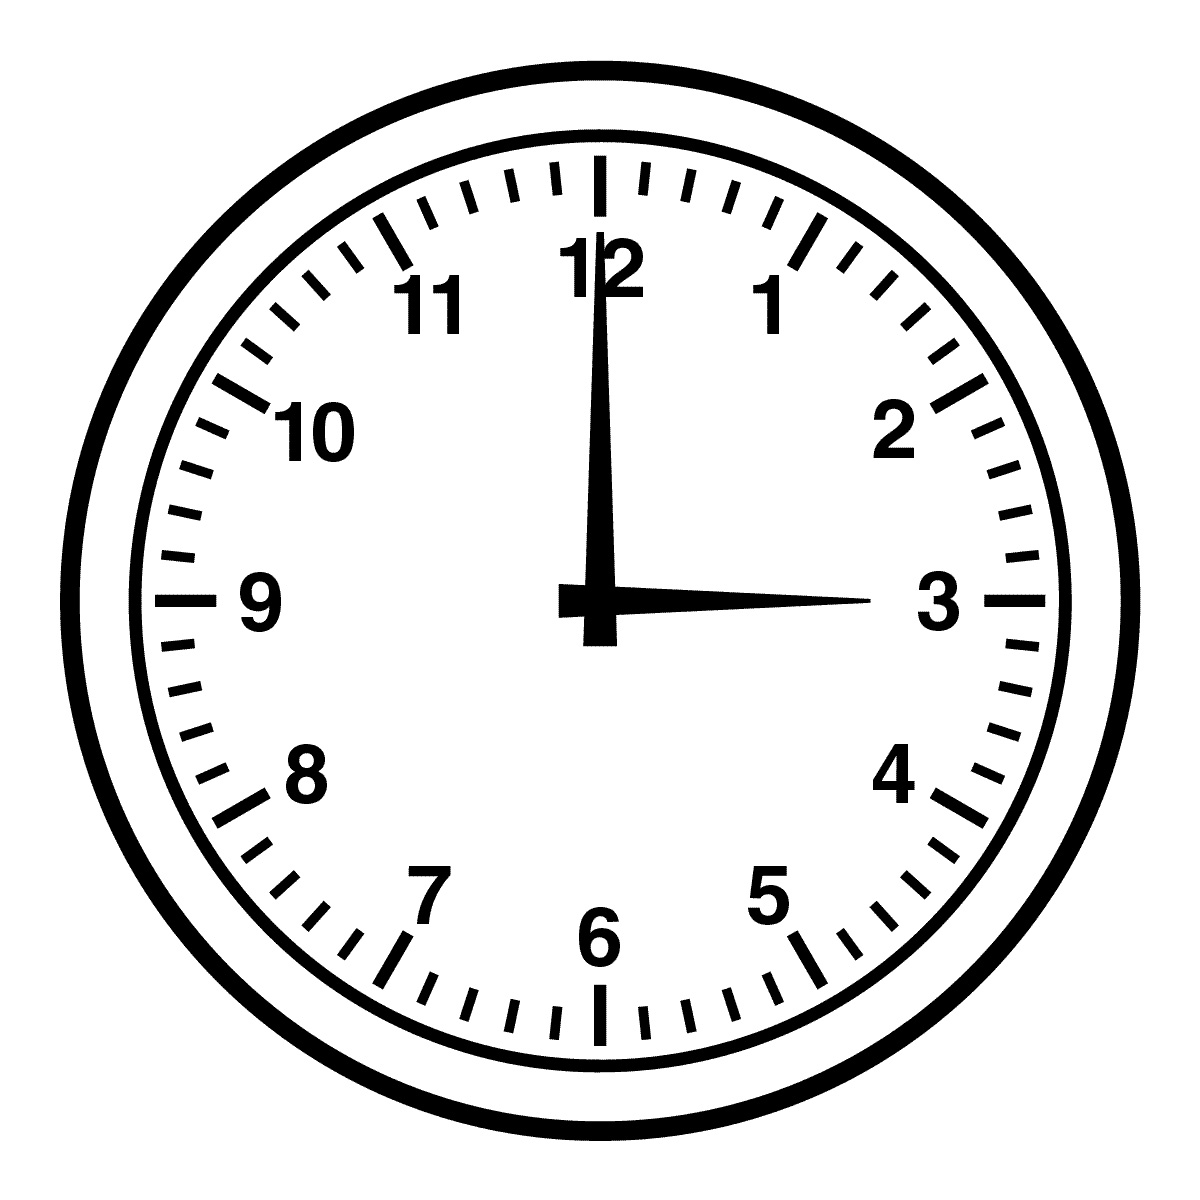 clip art clock face - Clock Face Clip Art